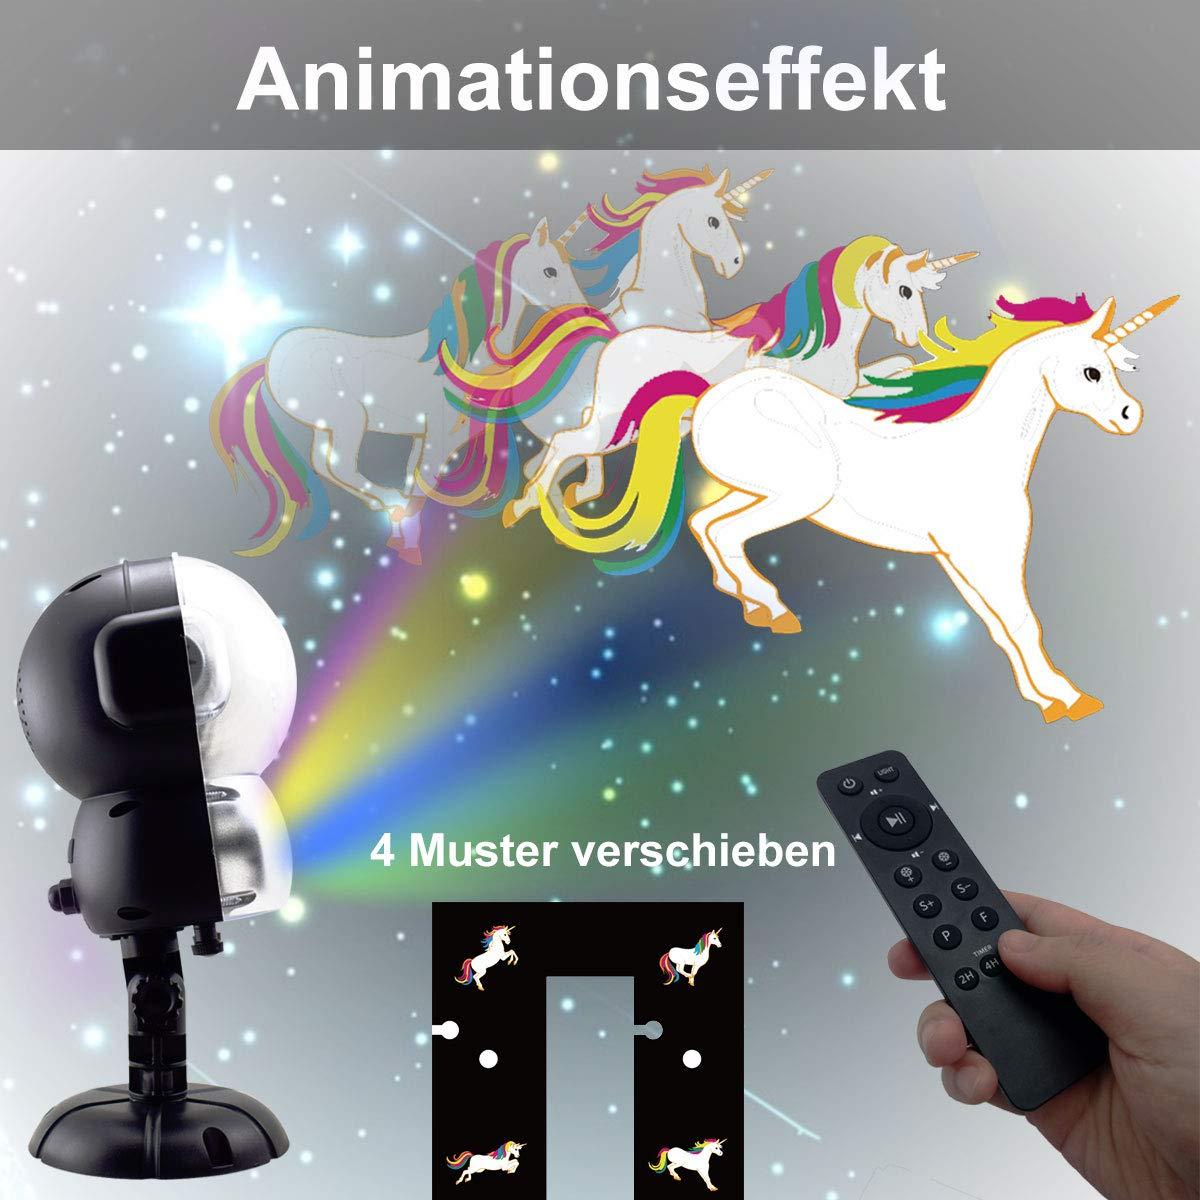 LED Schneefall Projektor Licht Animation Projektionslampe Außen ...